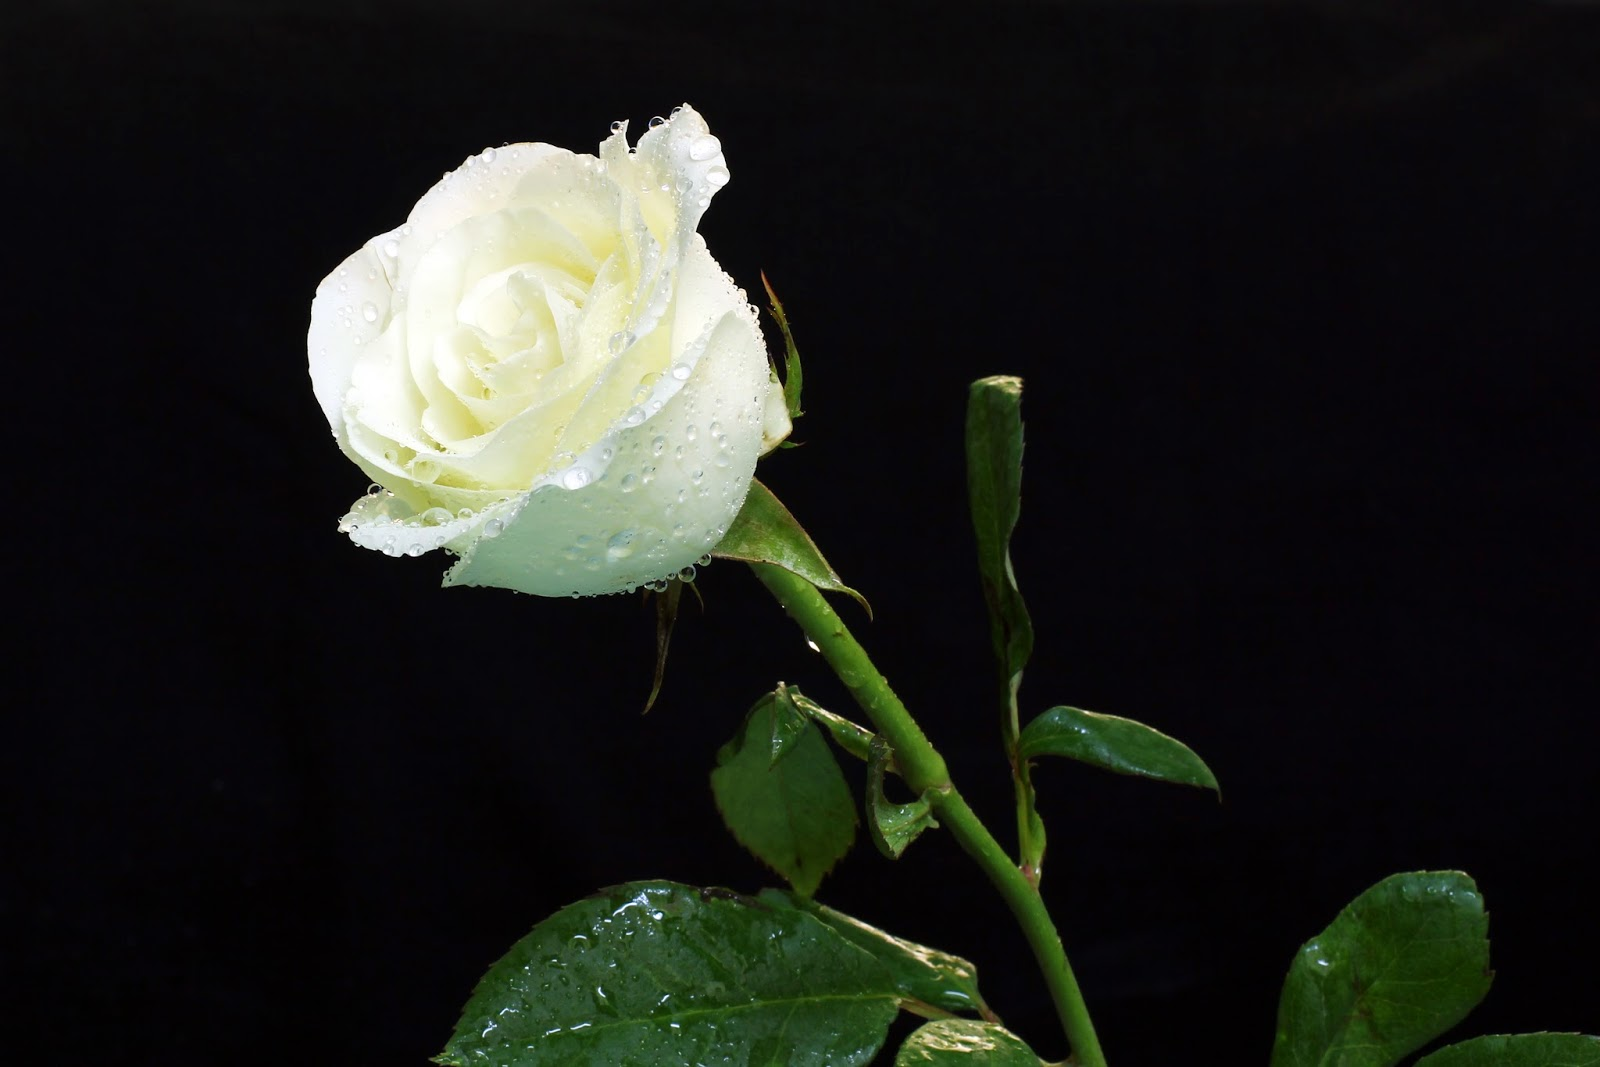 Bunga mawar putih yang indah melambangkan kemurnian. Sangat sering ...